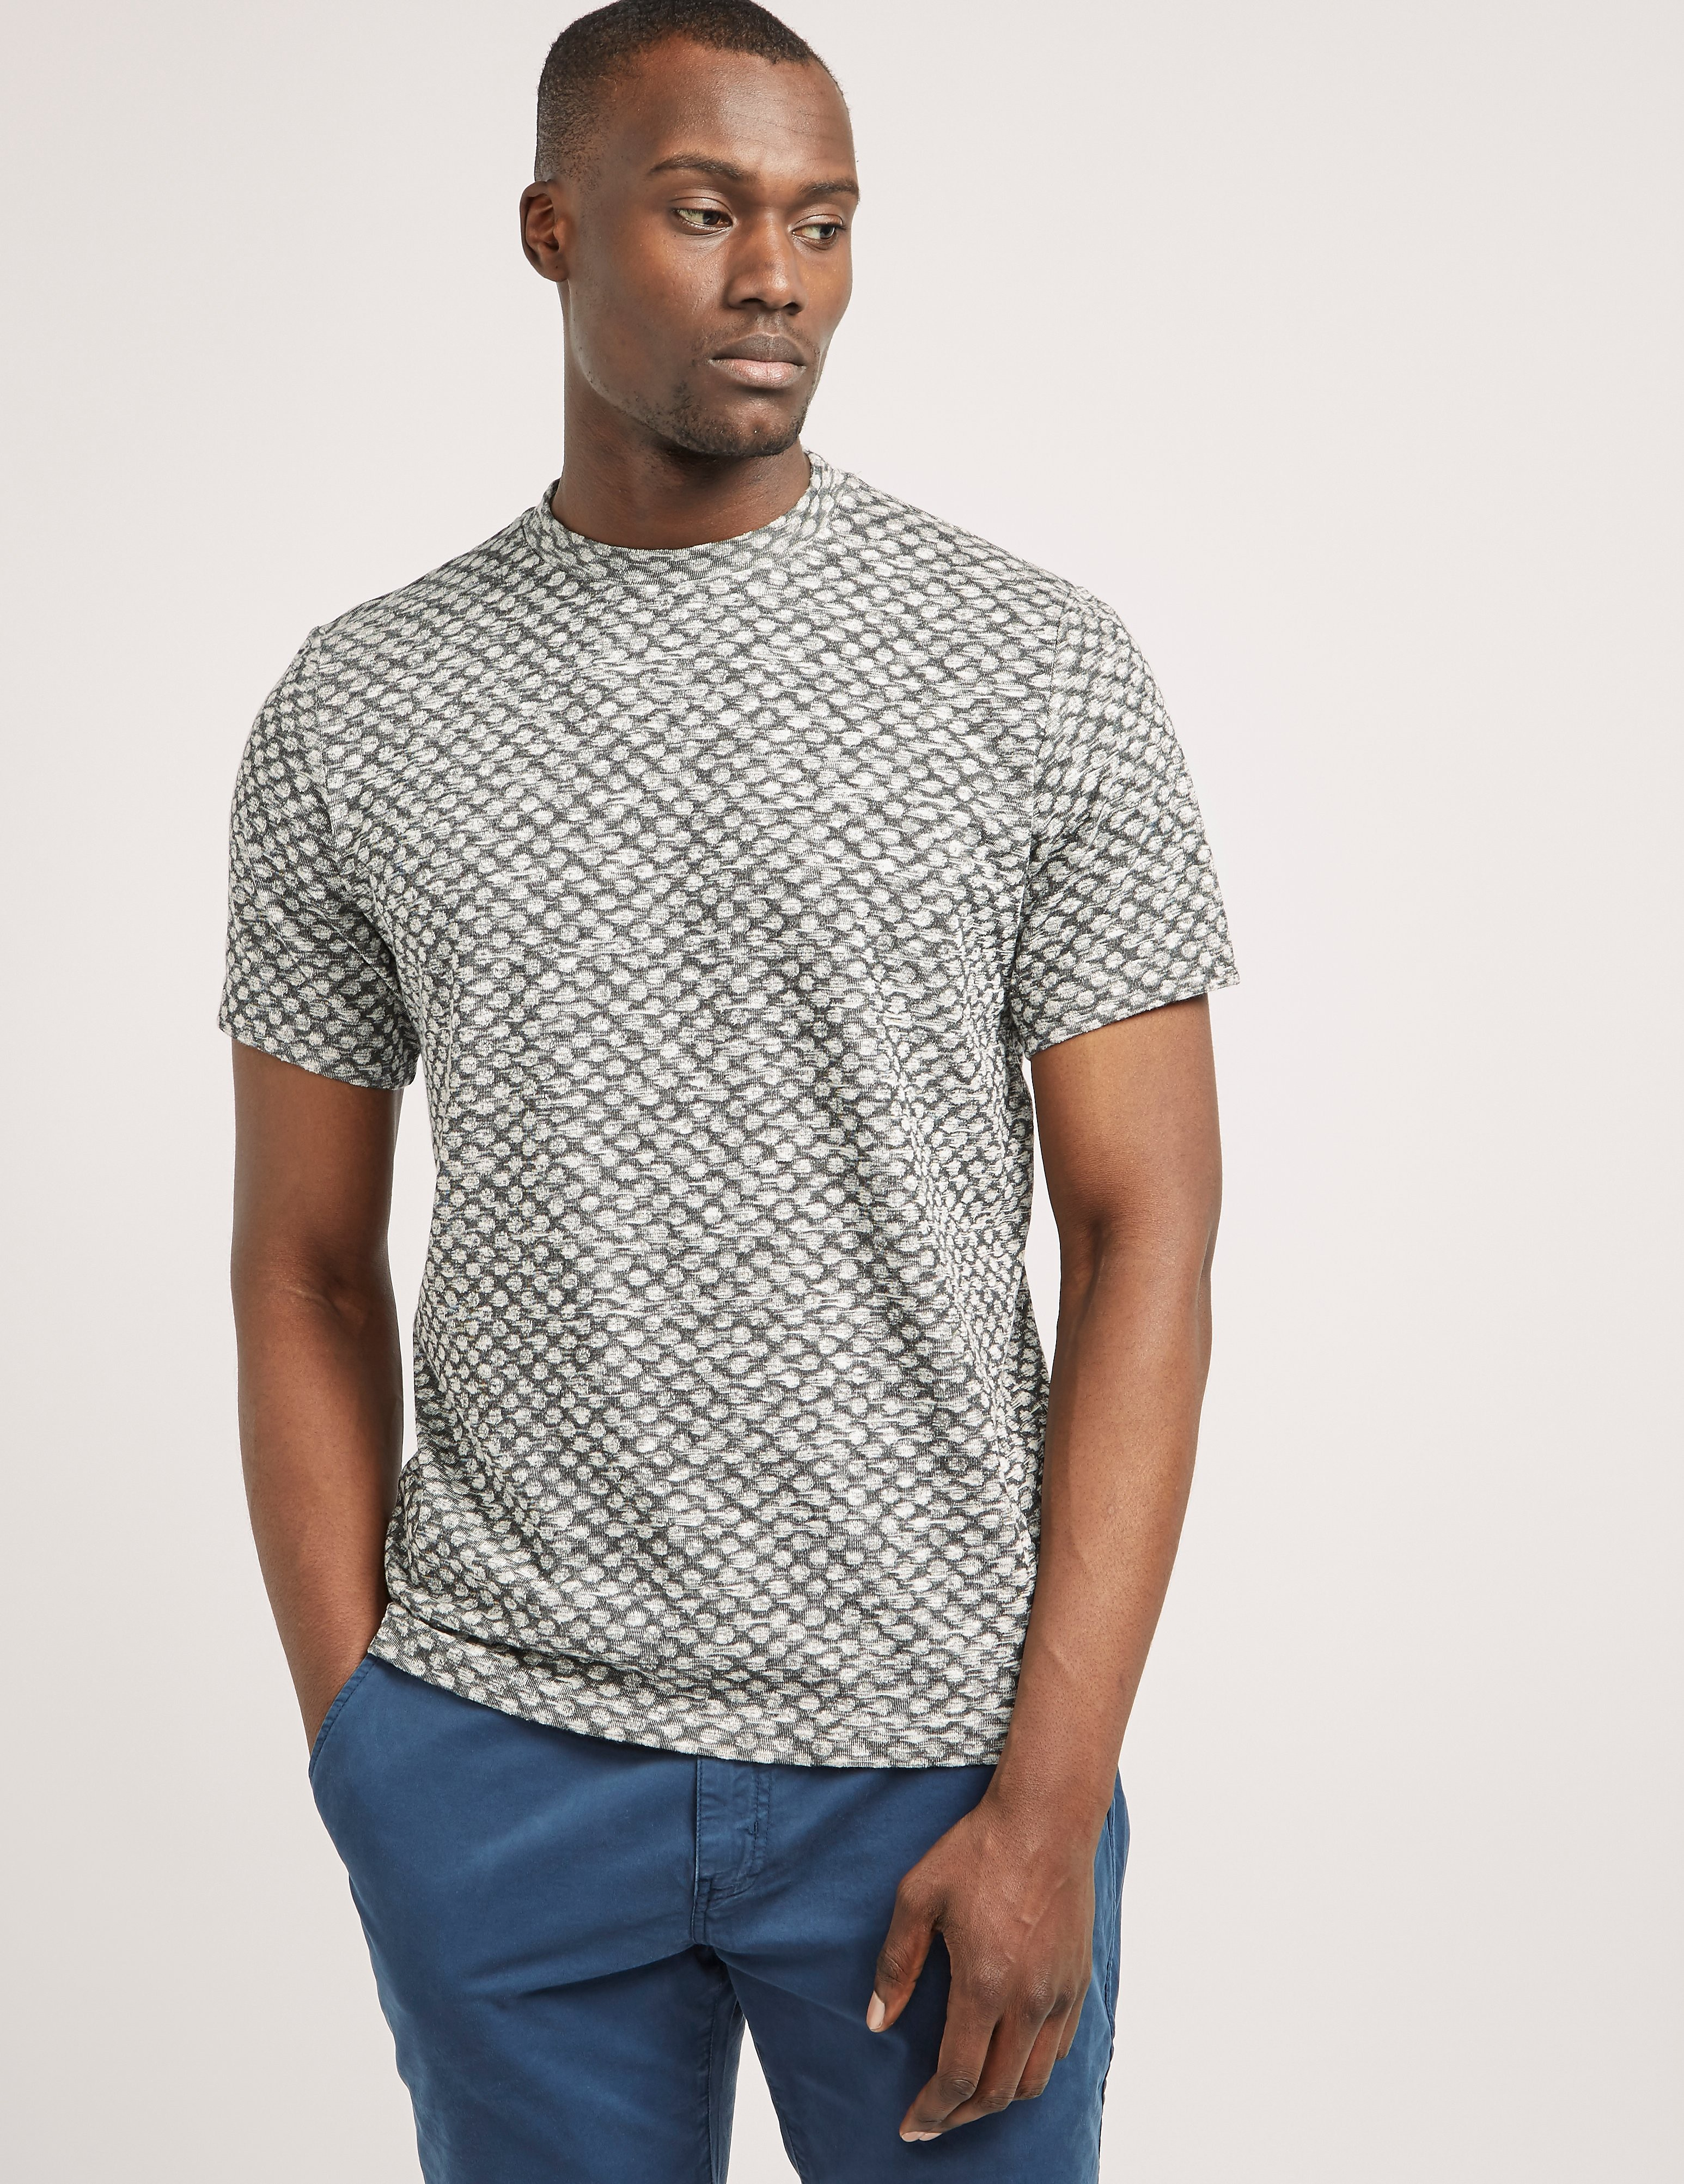 Paul Smith Jacquard Spot T-Shirt